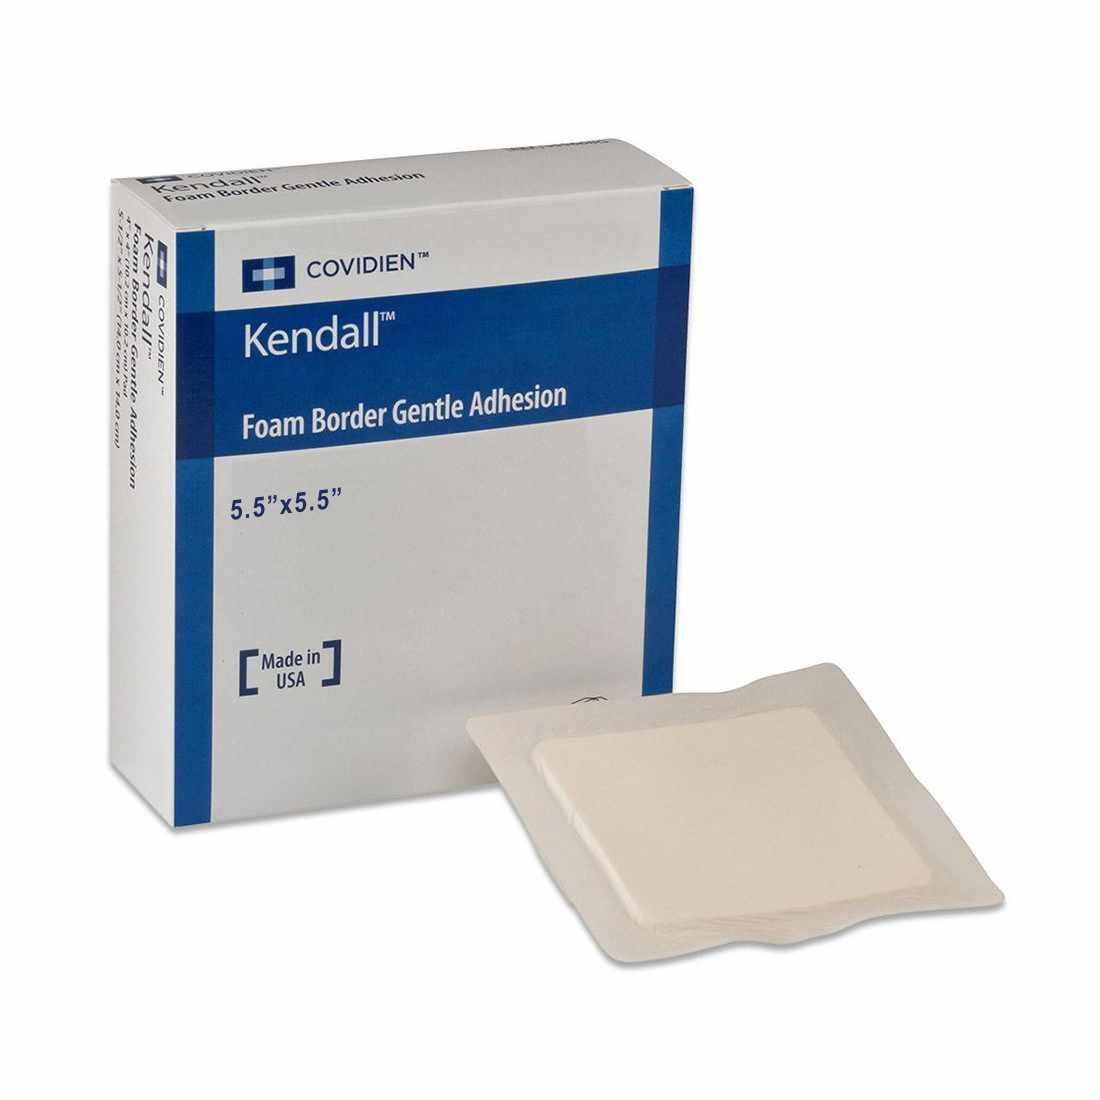 "Covidien border foam gentle adhesion dressing 5.5"" x 5.5"" pad size 4"" x 4"""